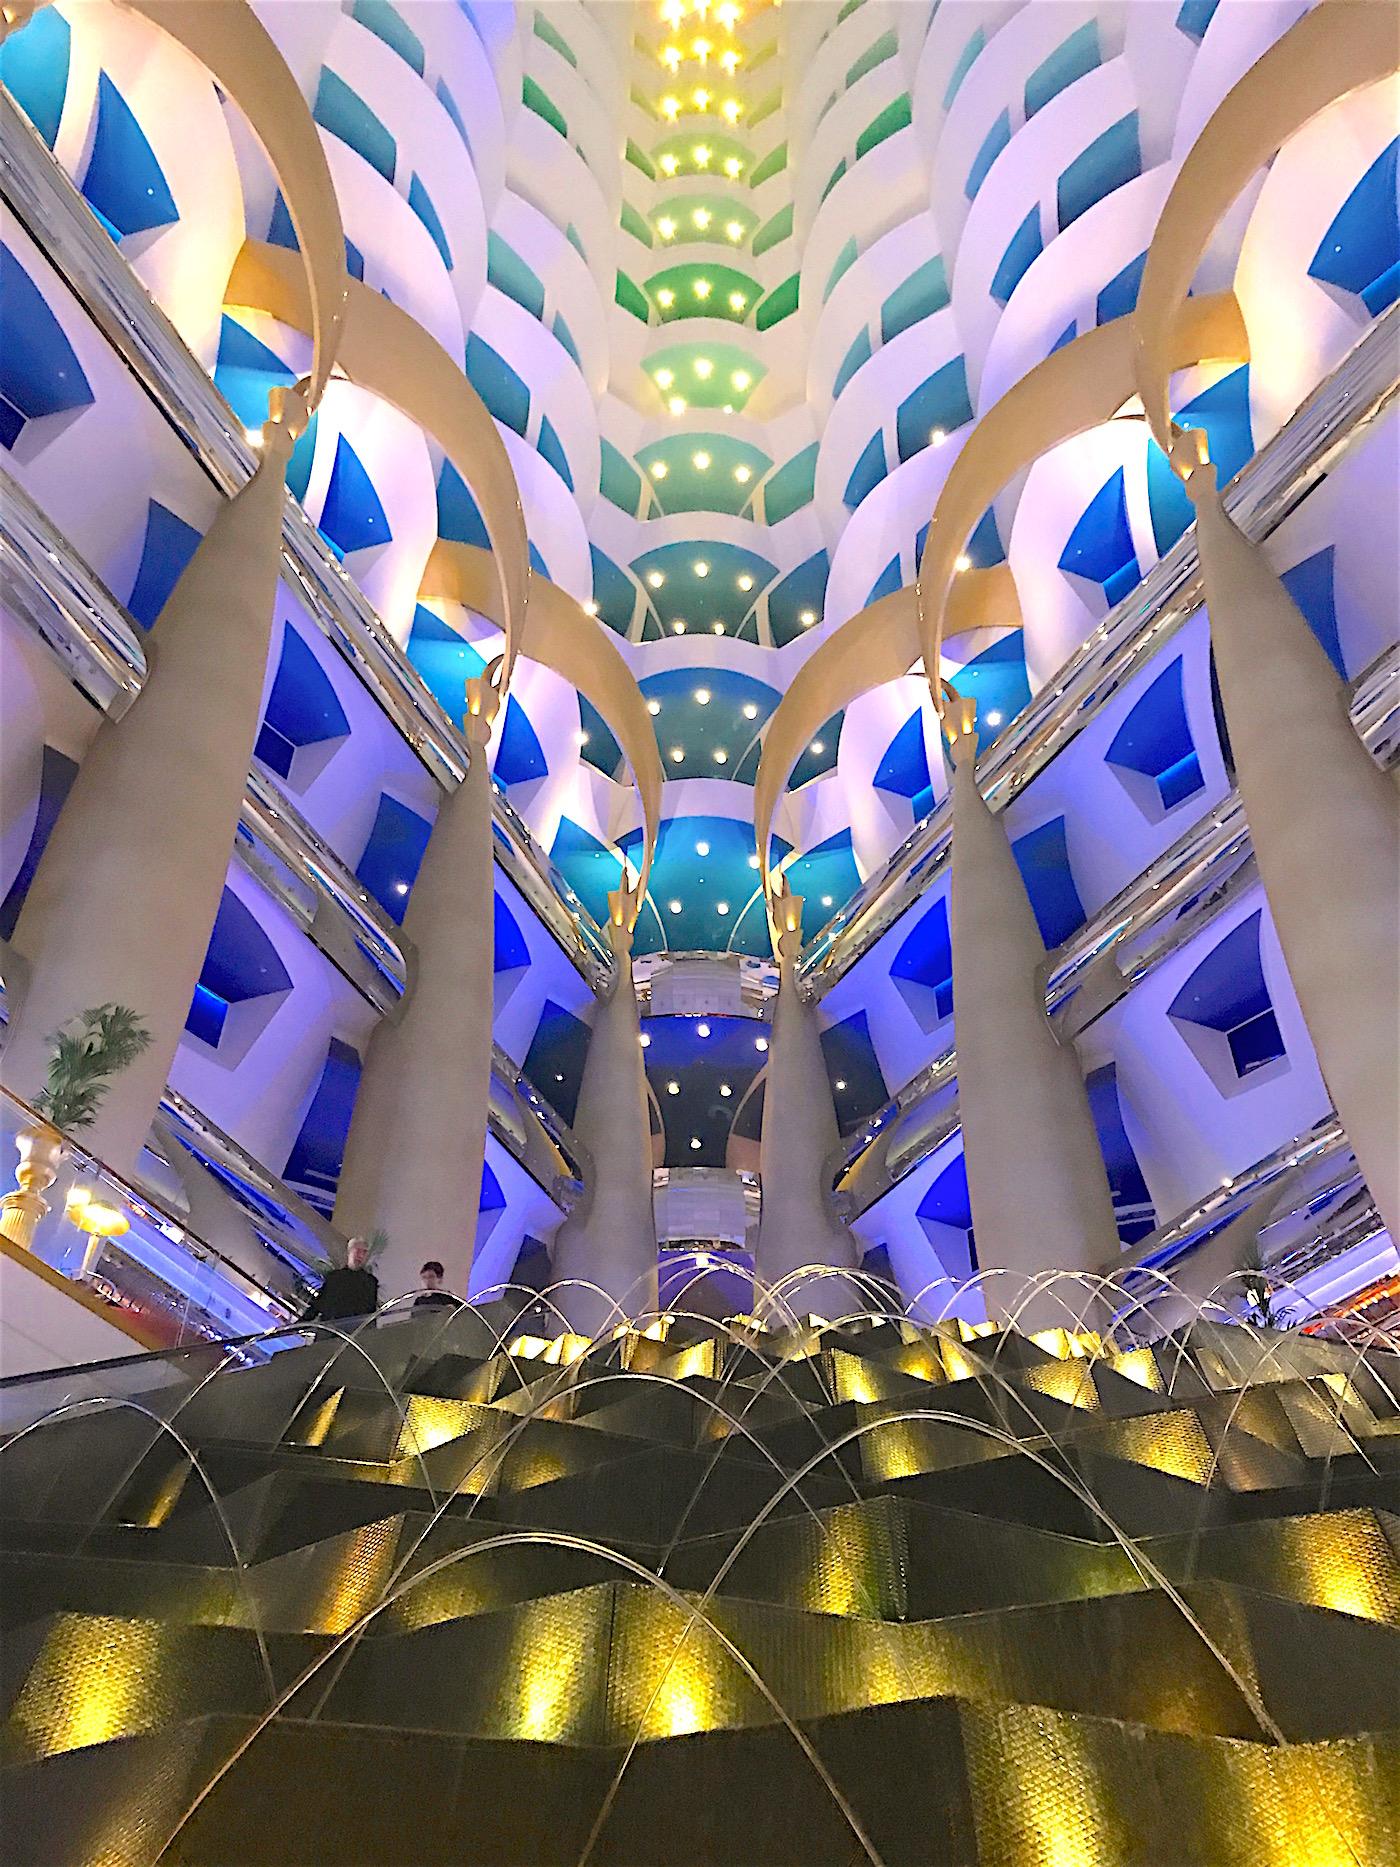 Stunning Lobby of The Hotel Burj Al Arab, Dubai